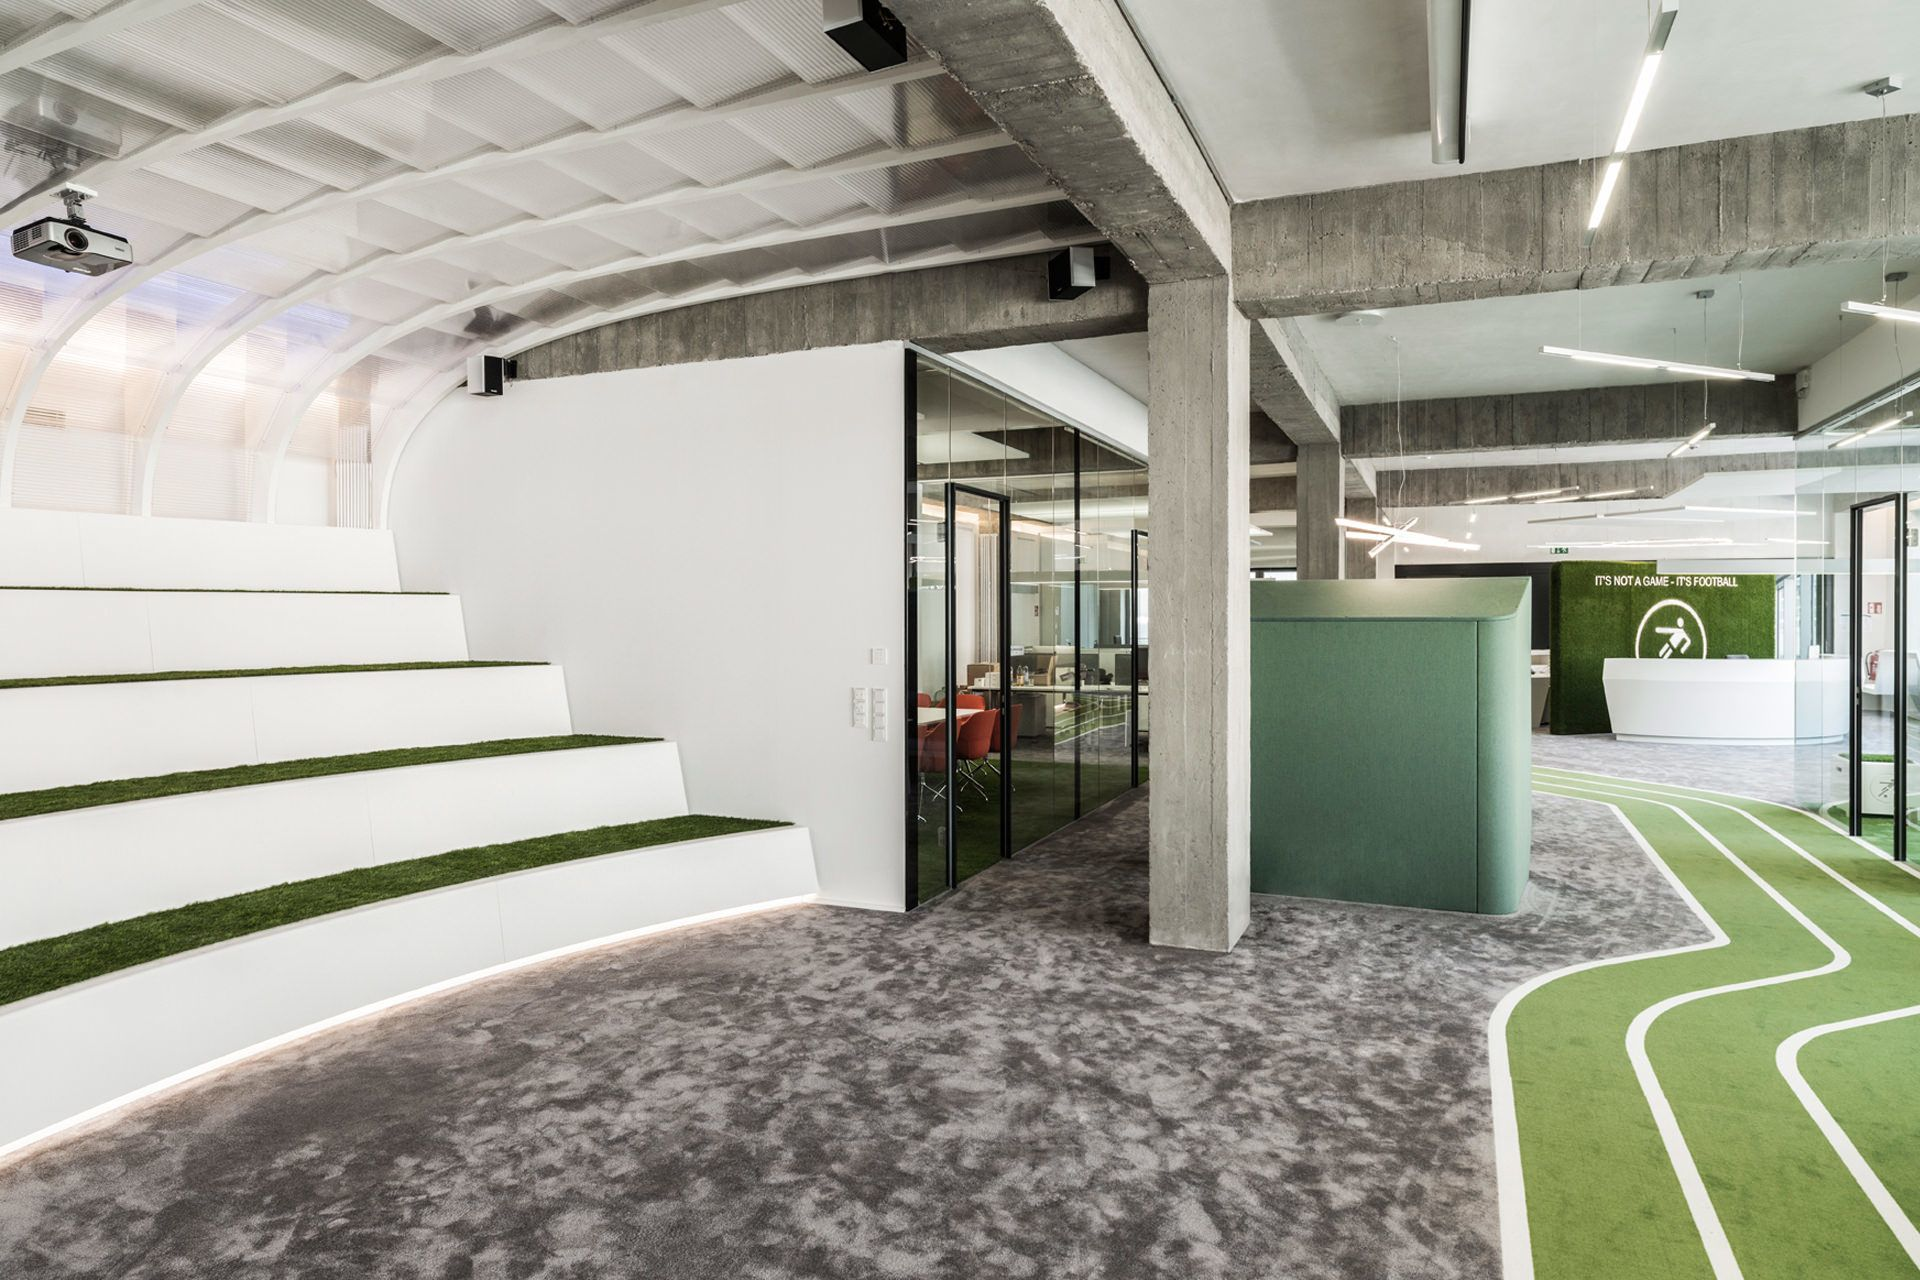 A Look Inside Onefootballs New Berlin Headquarters